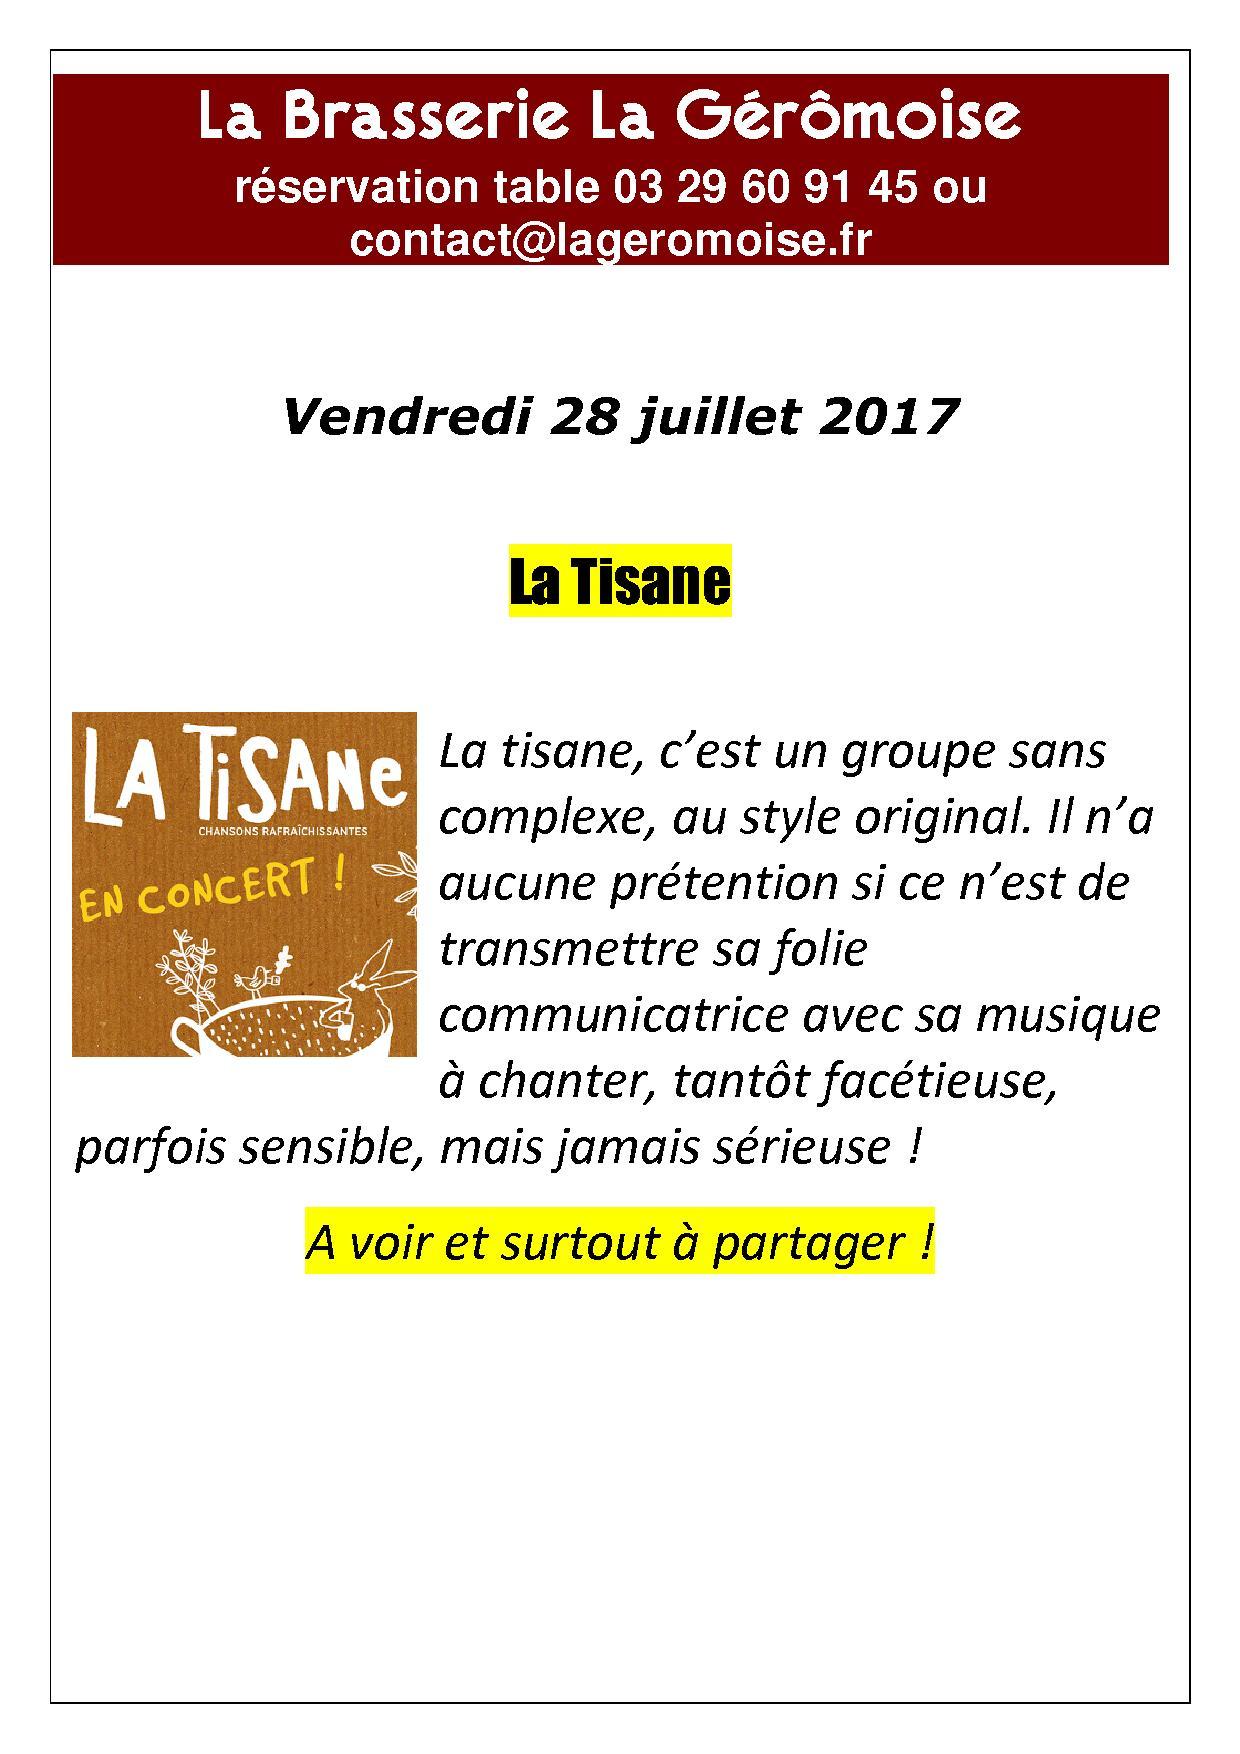 concerts-ete-2017-juillet-la-tisane-quare-steam-pascal-muller.jpg